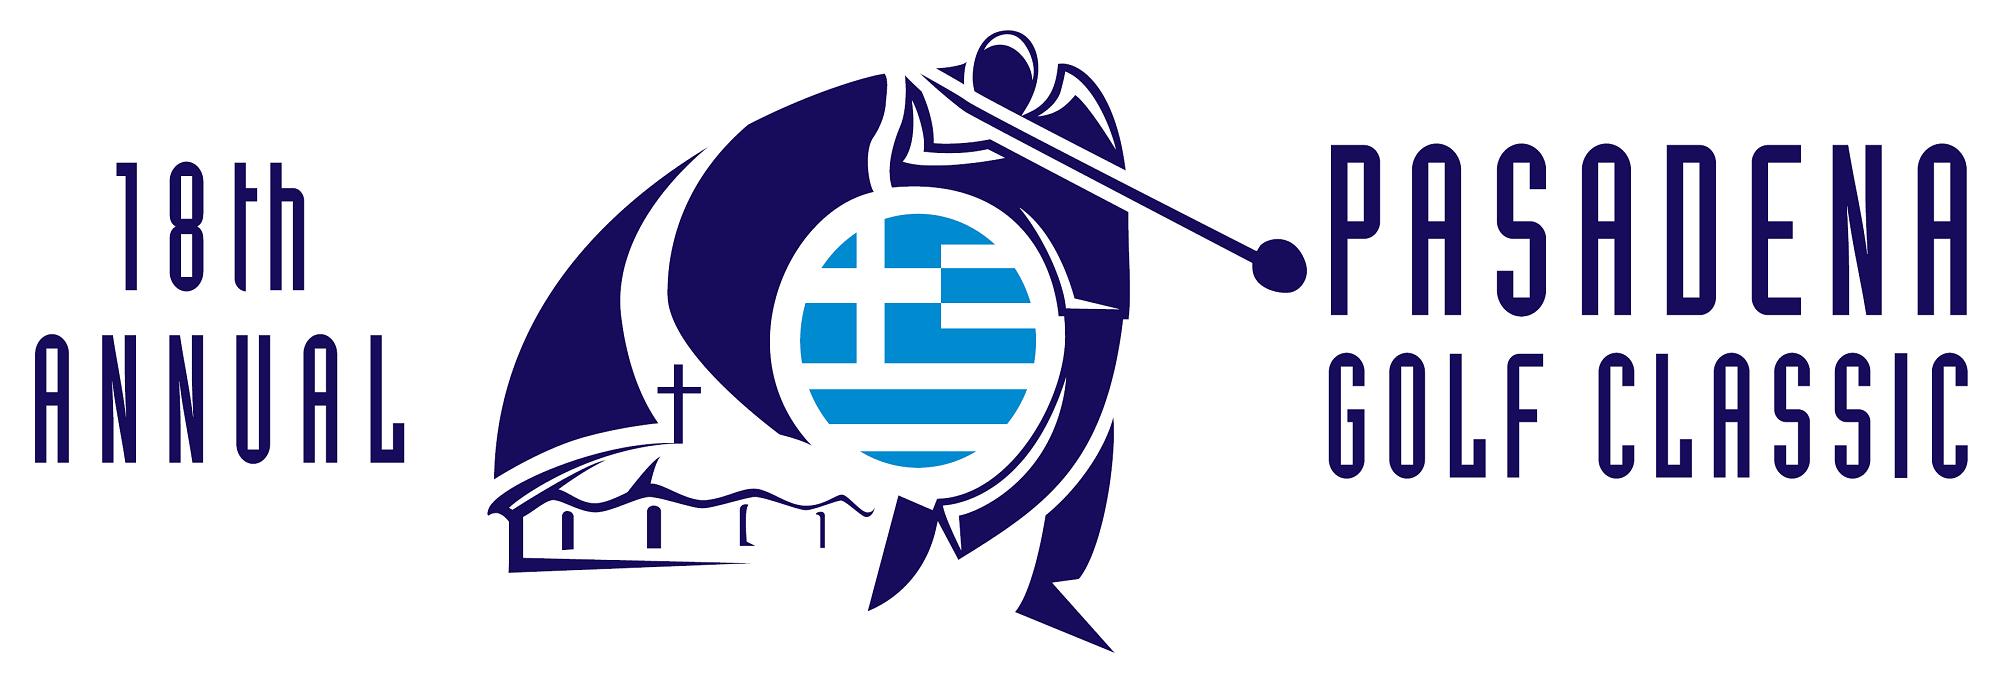 18th Annual Pasadena Golf Classic